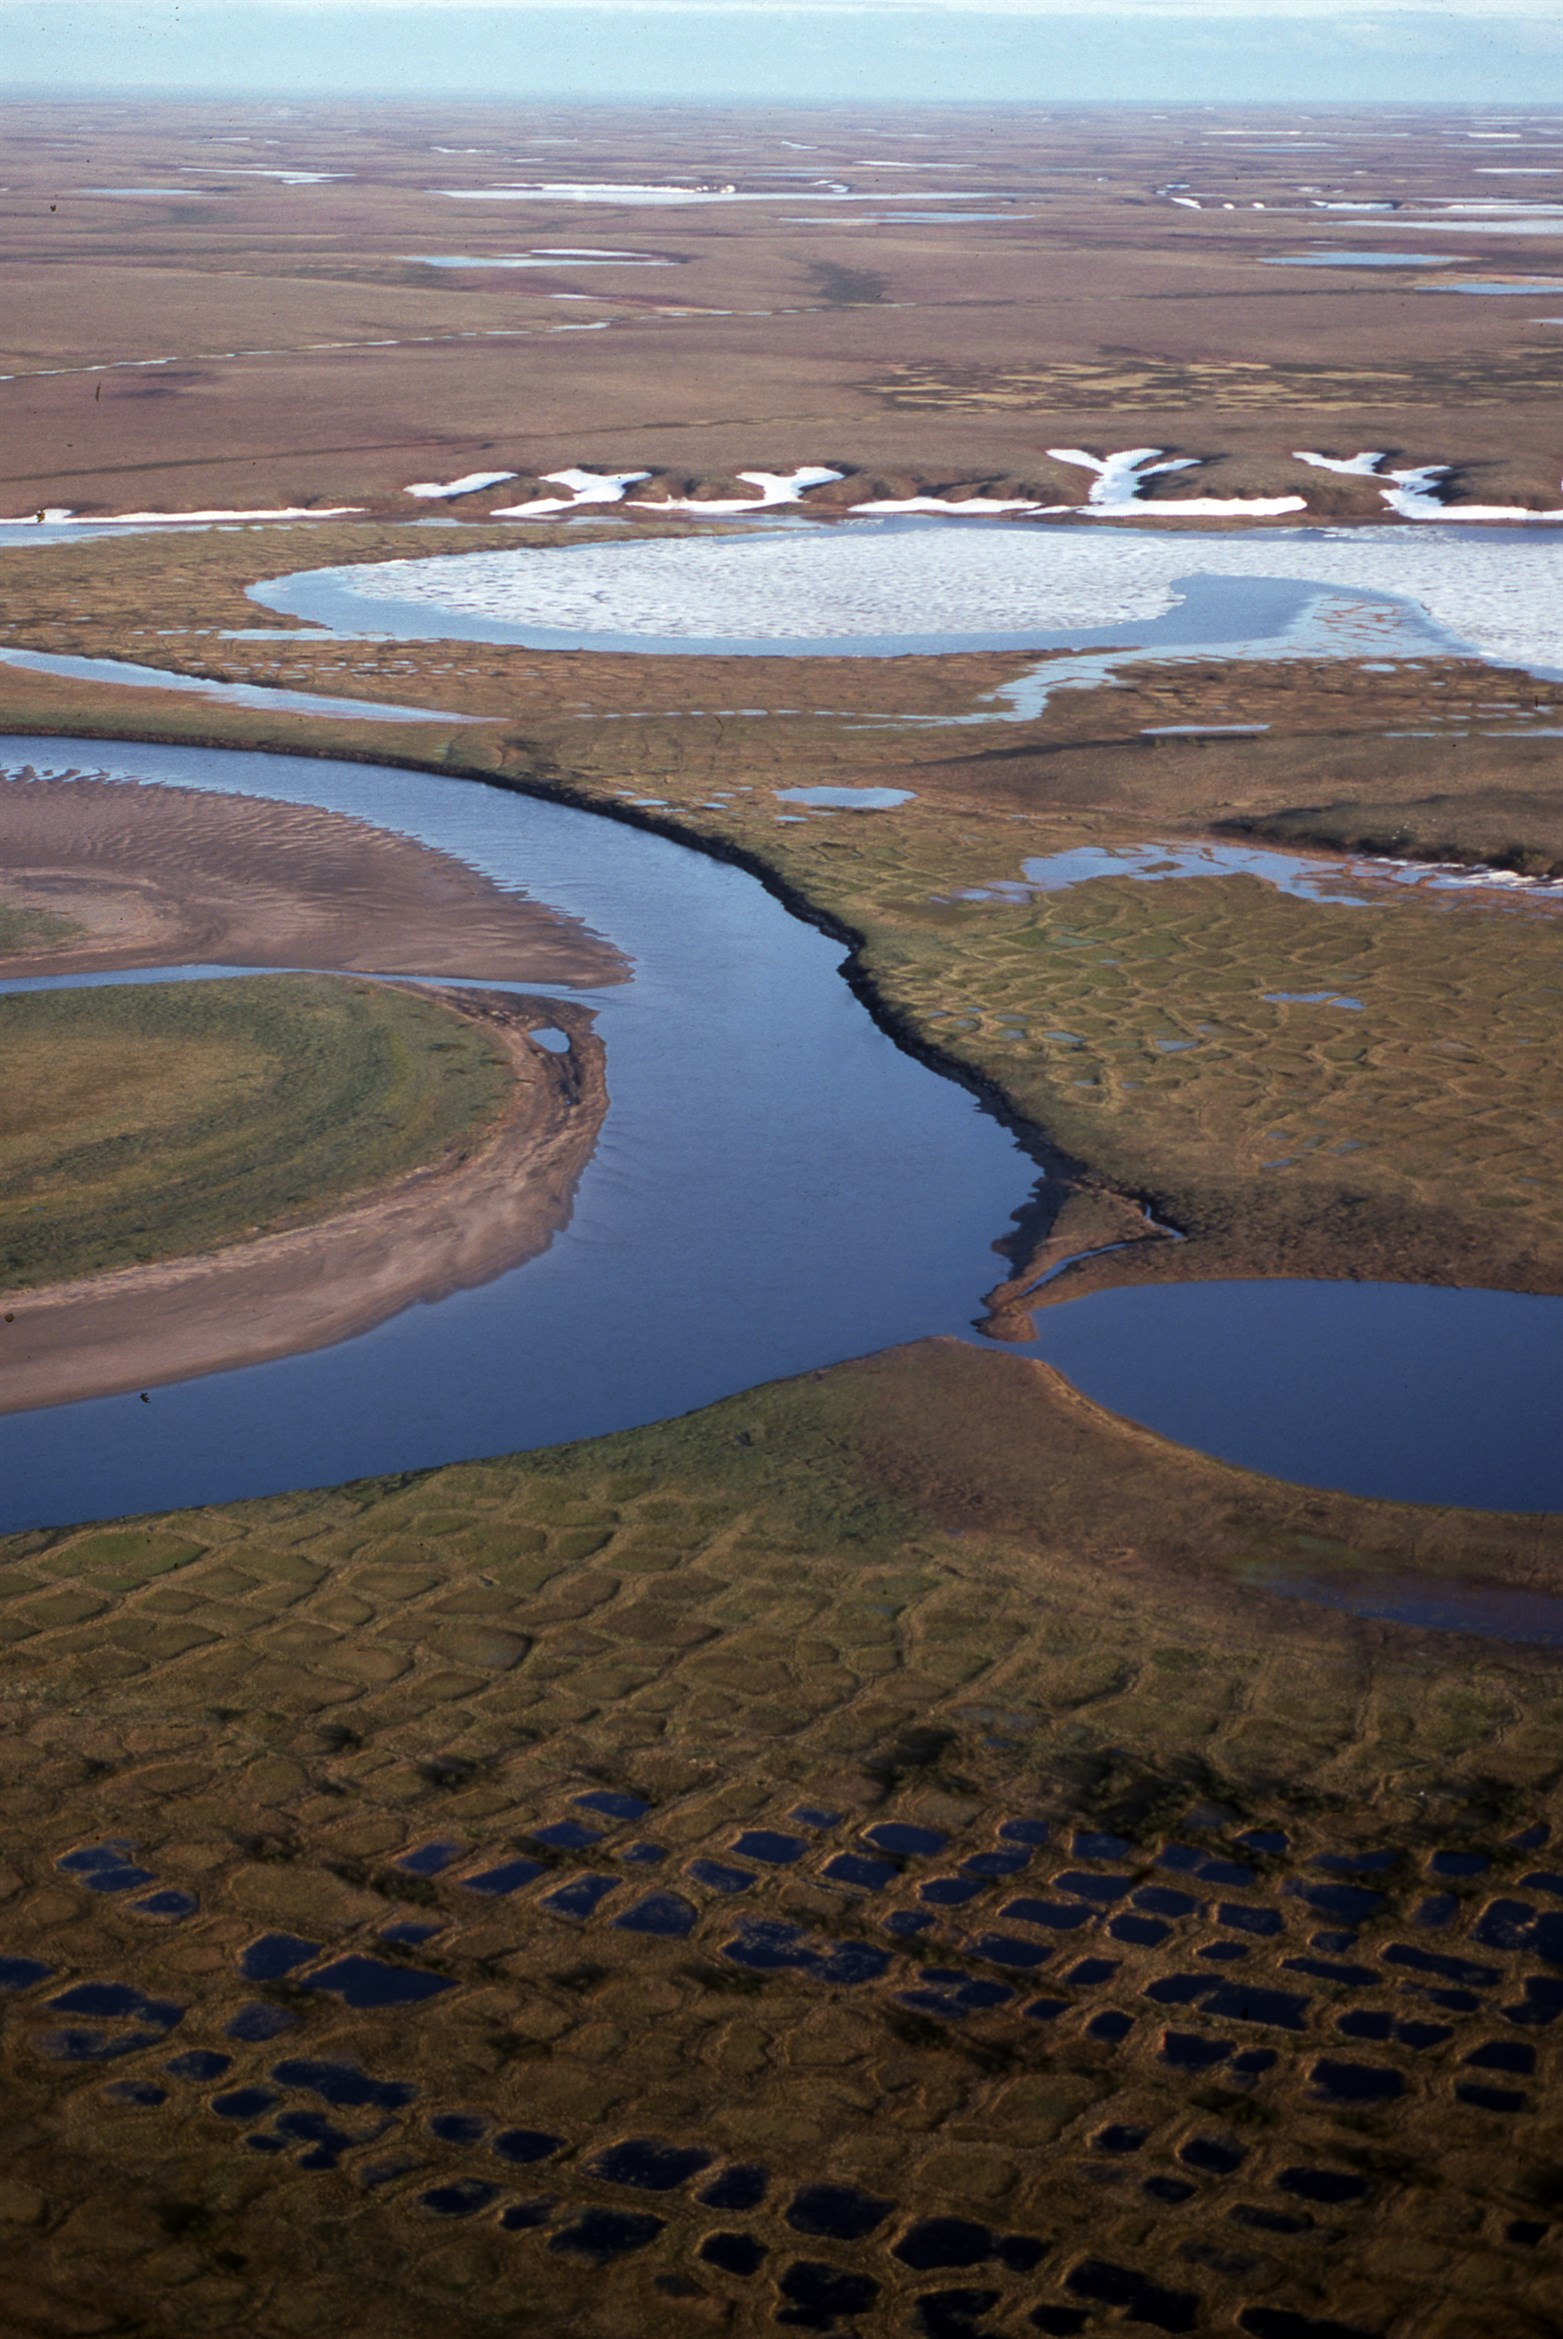 tundra-landscape-southeast-taimyr-siberia-russia-july-1993_adb3-2339x3500px